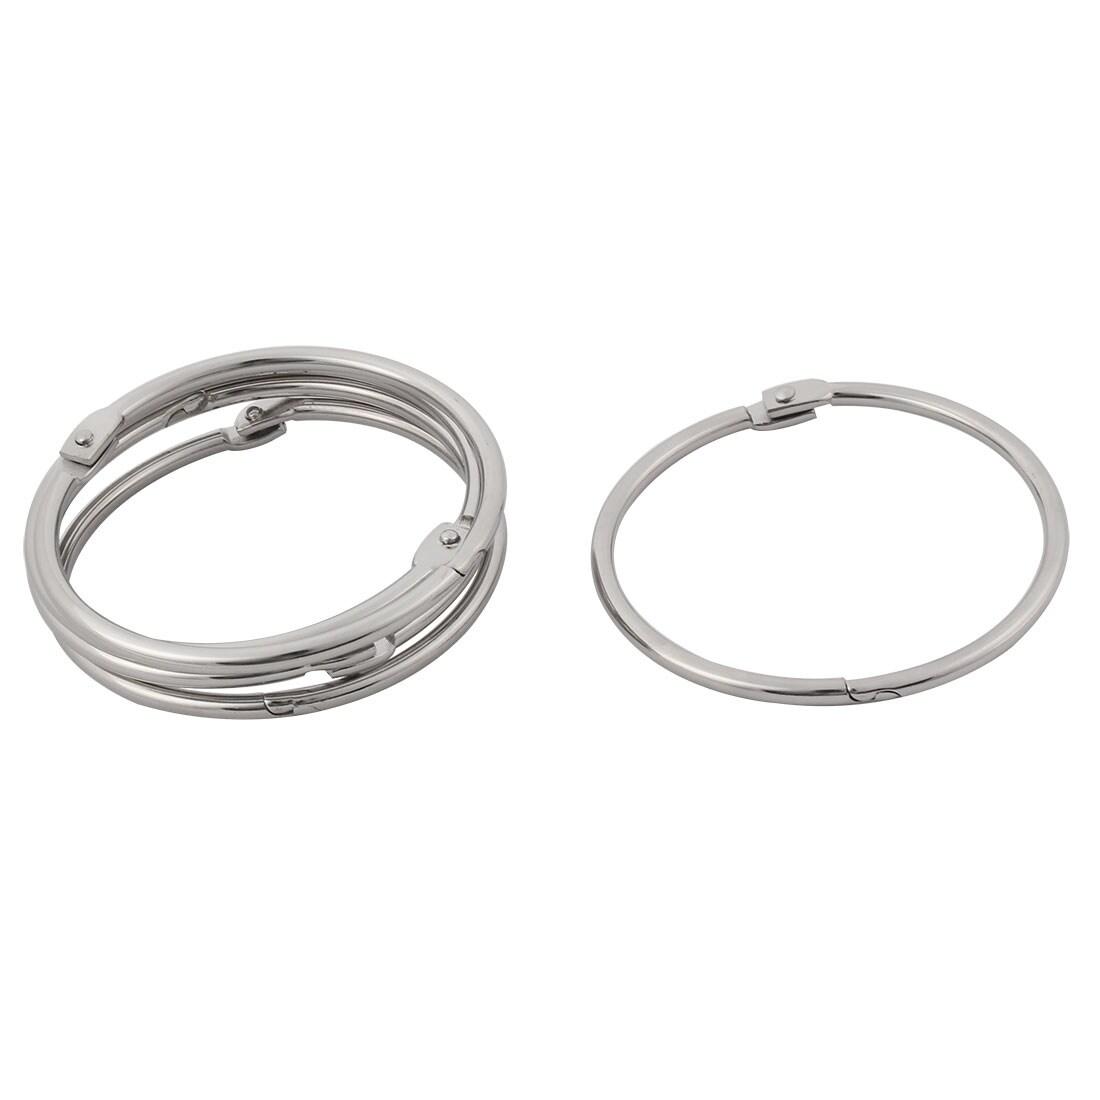 Shop Unique Bargainshandbag Wallet Free Diy Keyring Key Chain Split Loop Holder 75mm Inner Dia 5pcs Free Shipping On Orders Over 45 Overstock 18436280